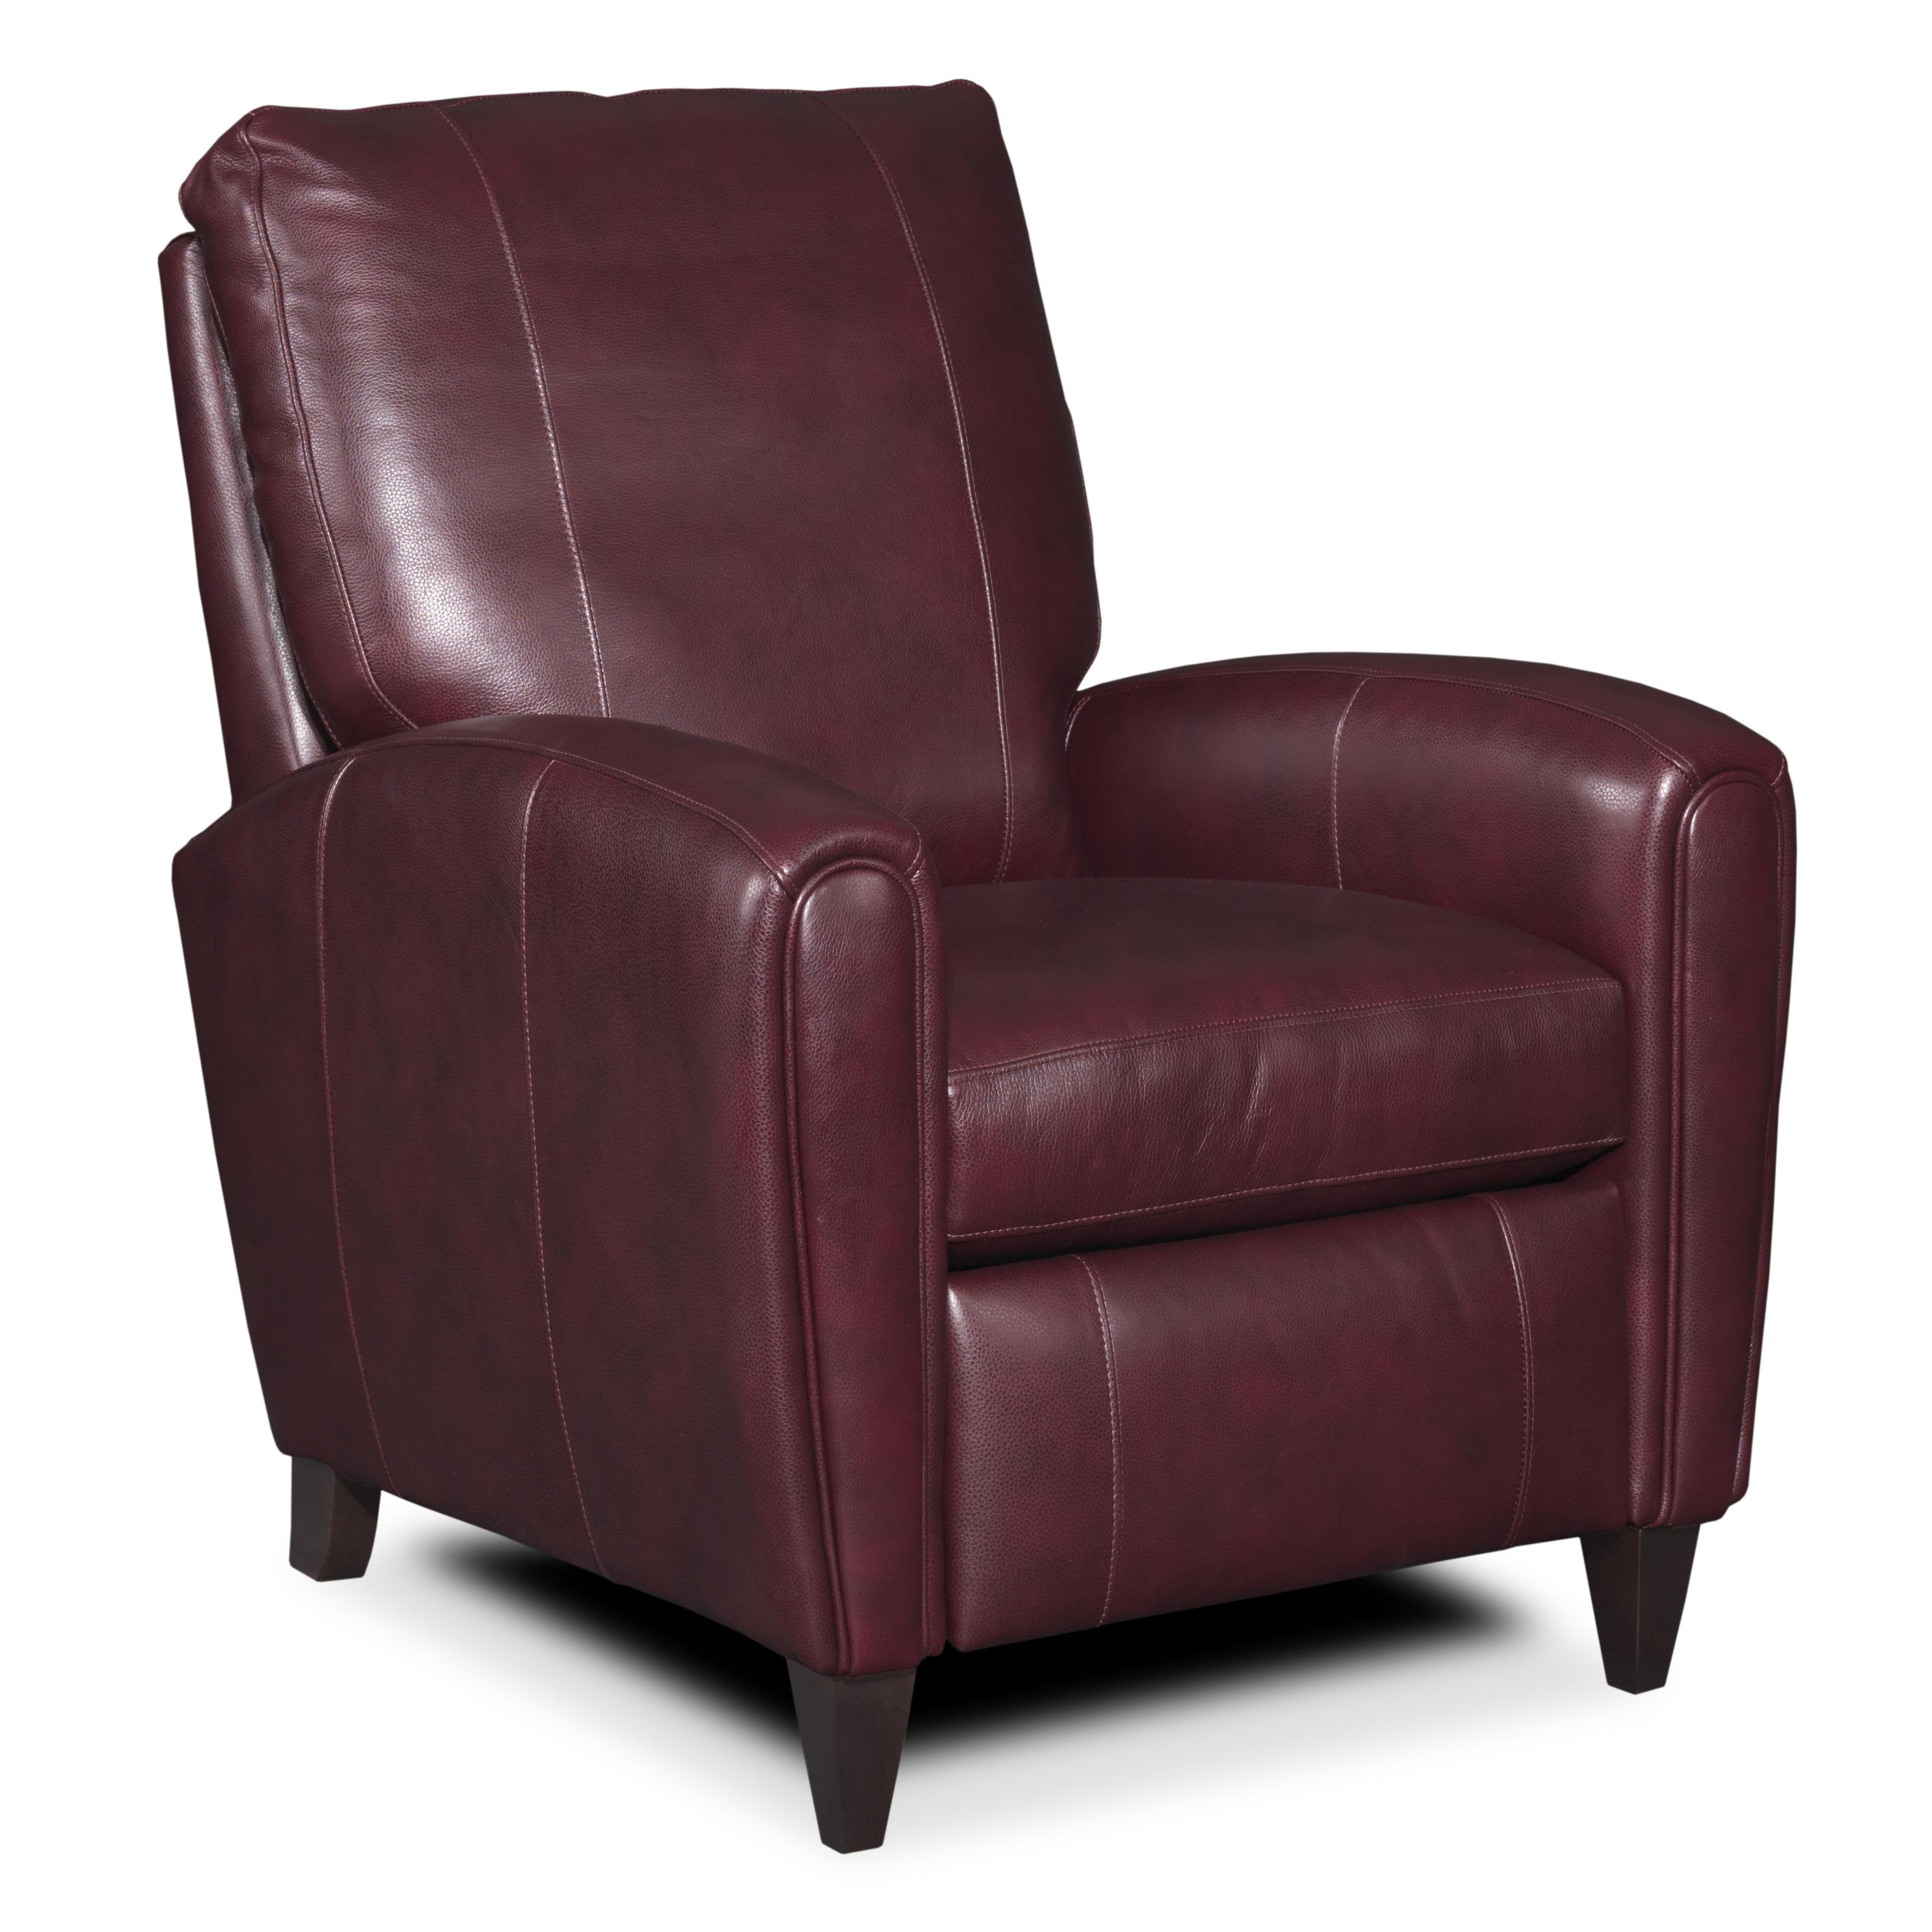 Chairs That Recline Hamill High Leg Recliner